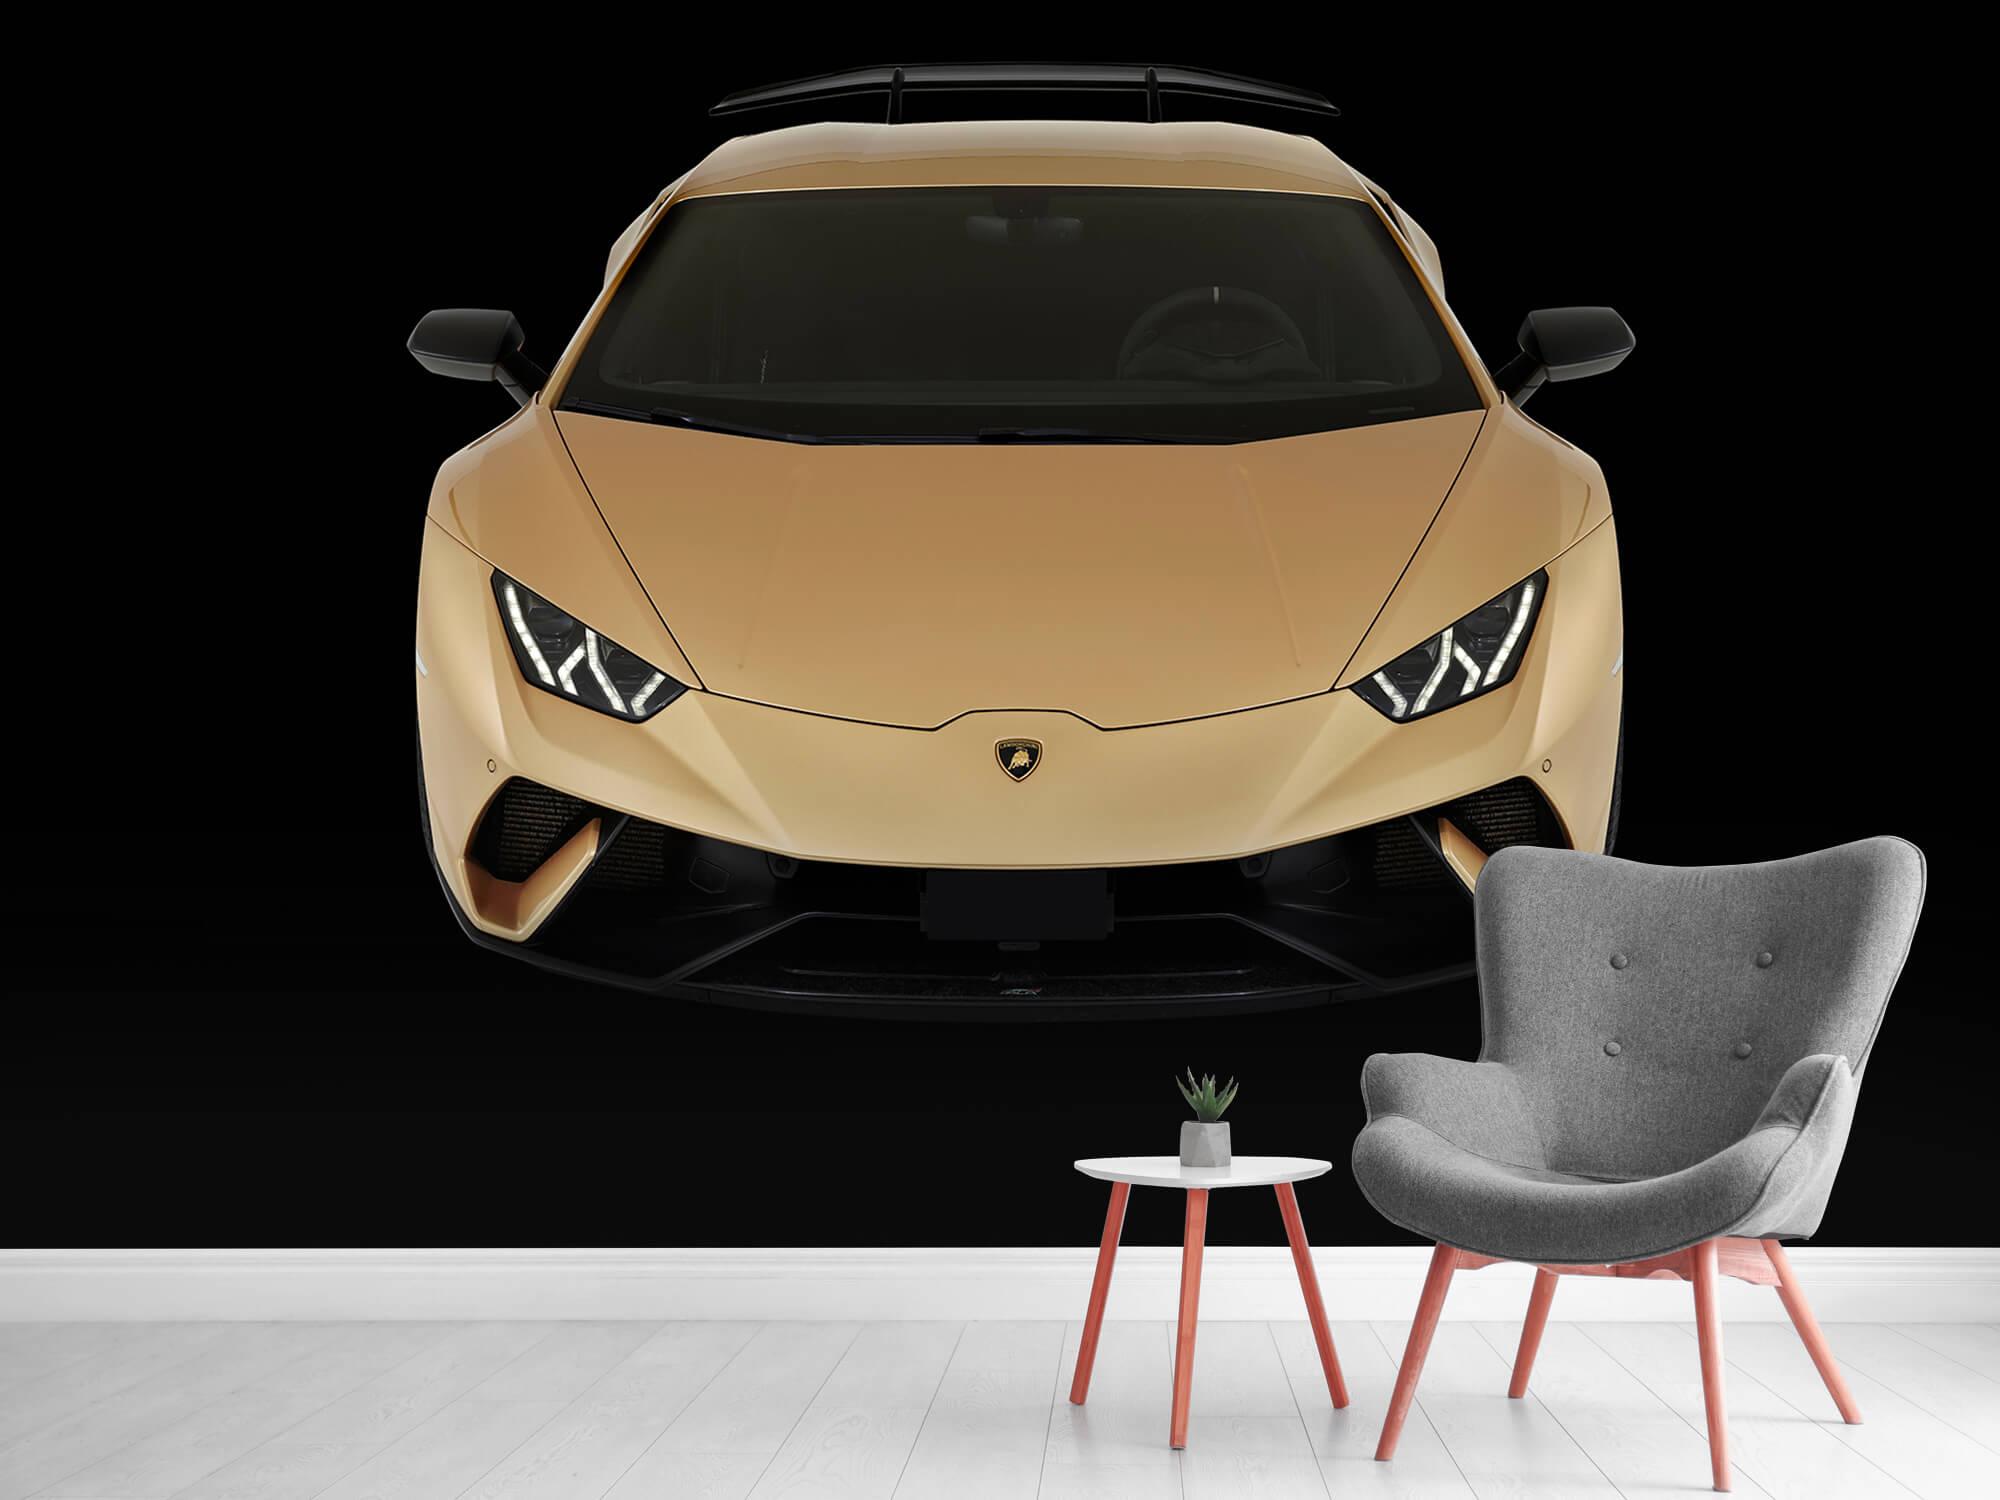 Wallpaper Lamborghini Huracán - Avant du dessus, noir 10